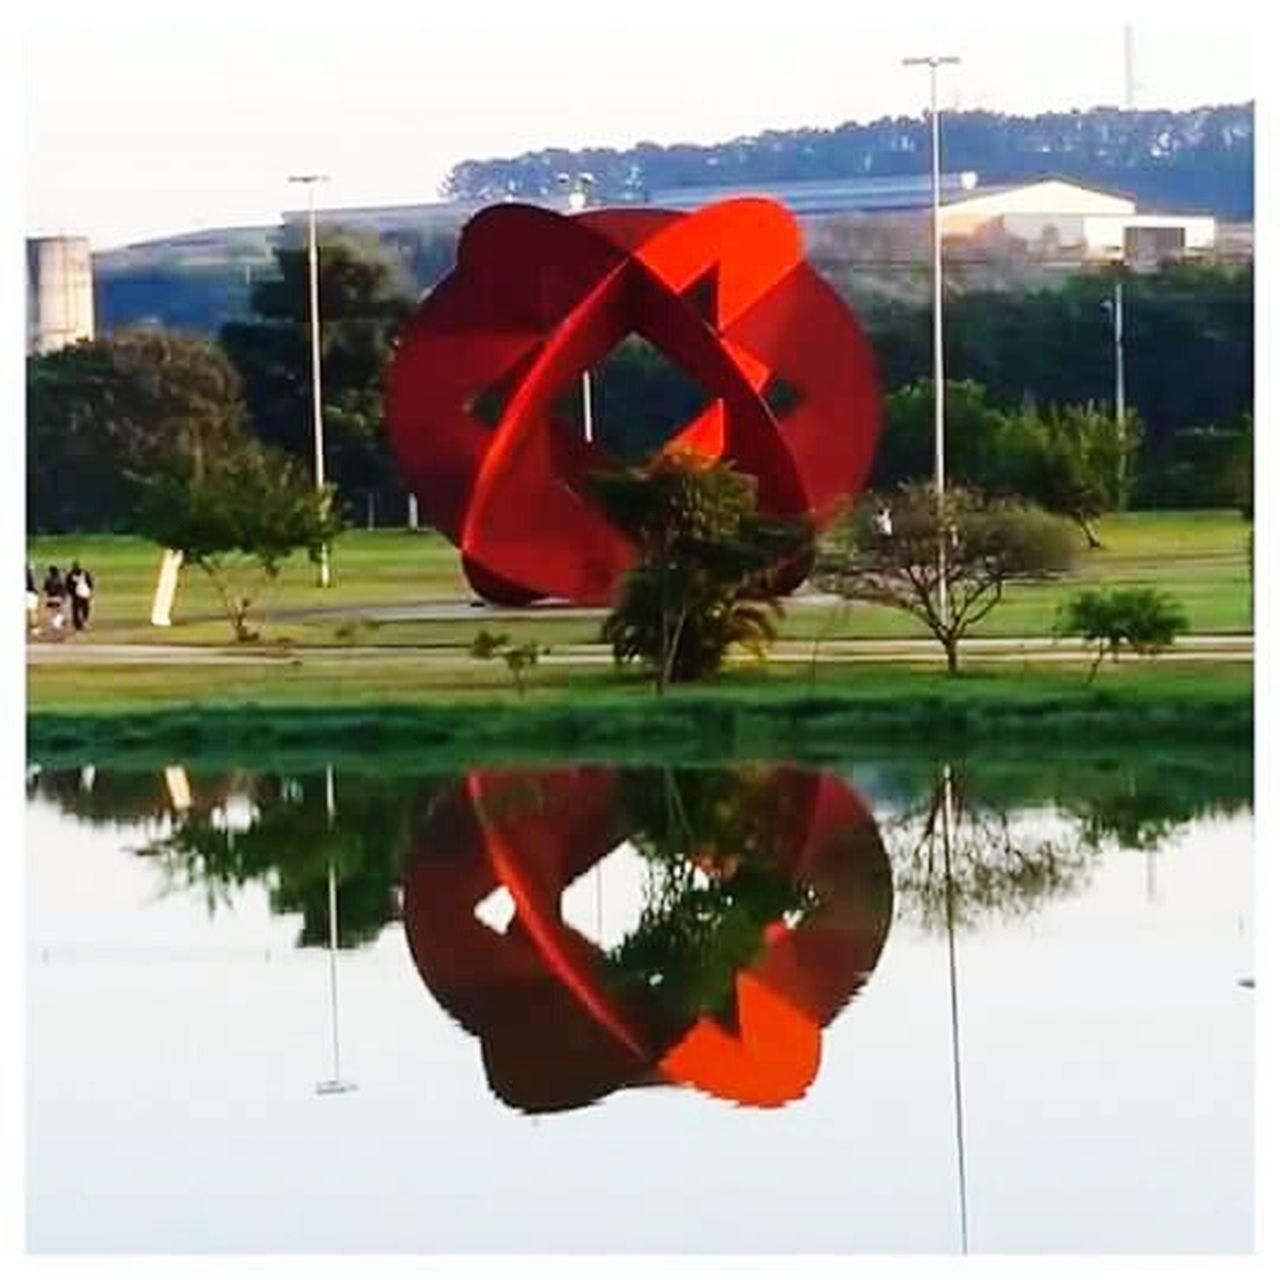 Parquedasaguas Sorocaba